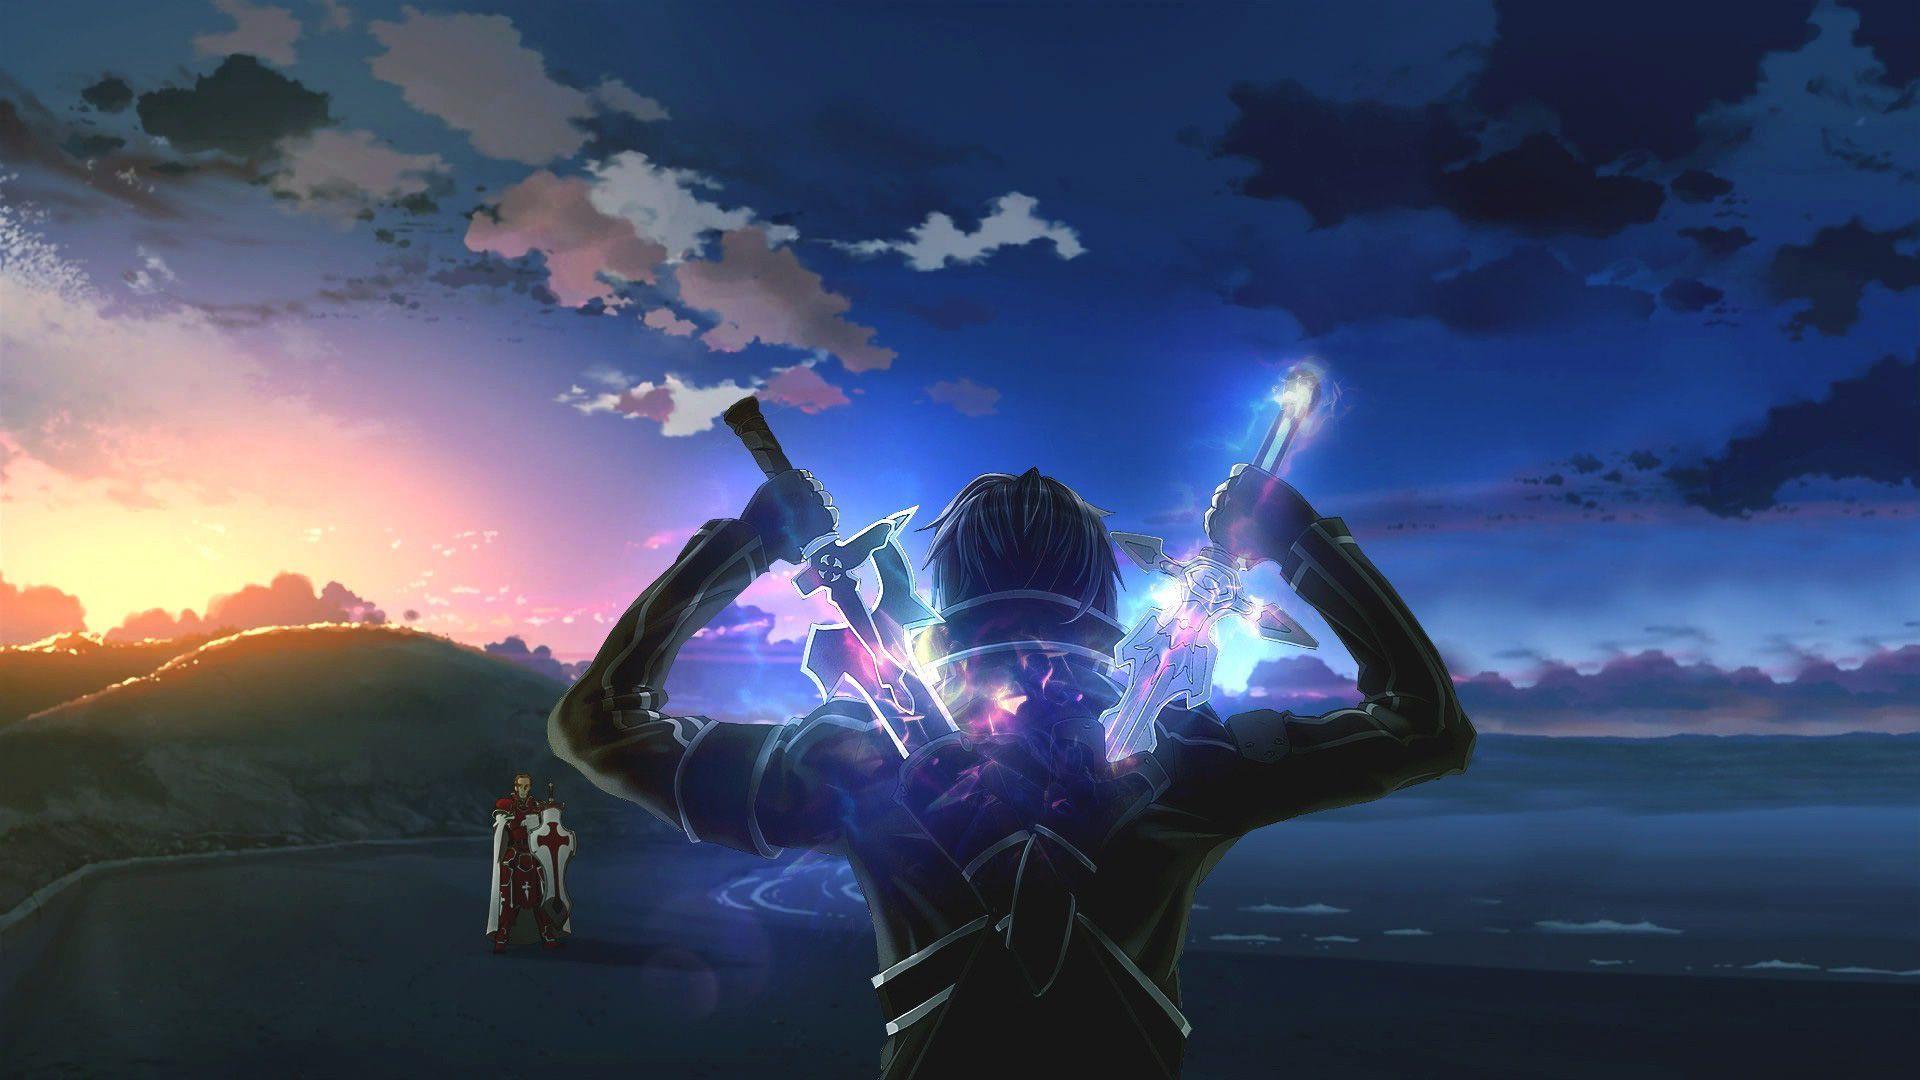 hd wallaper sao sword - photo #6